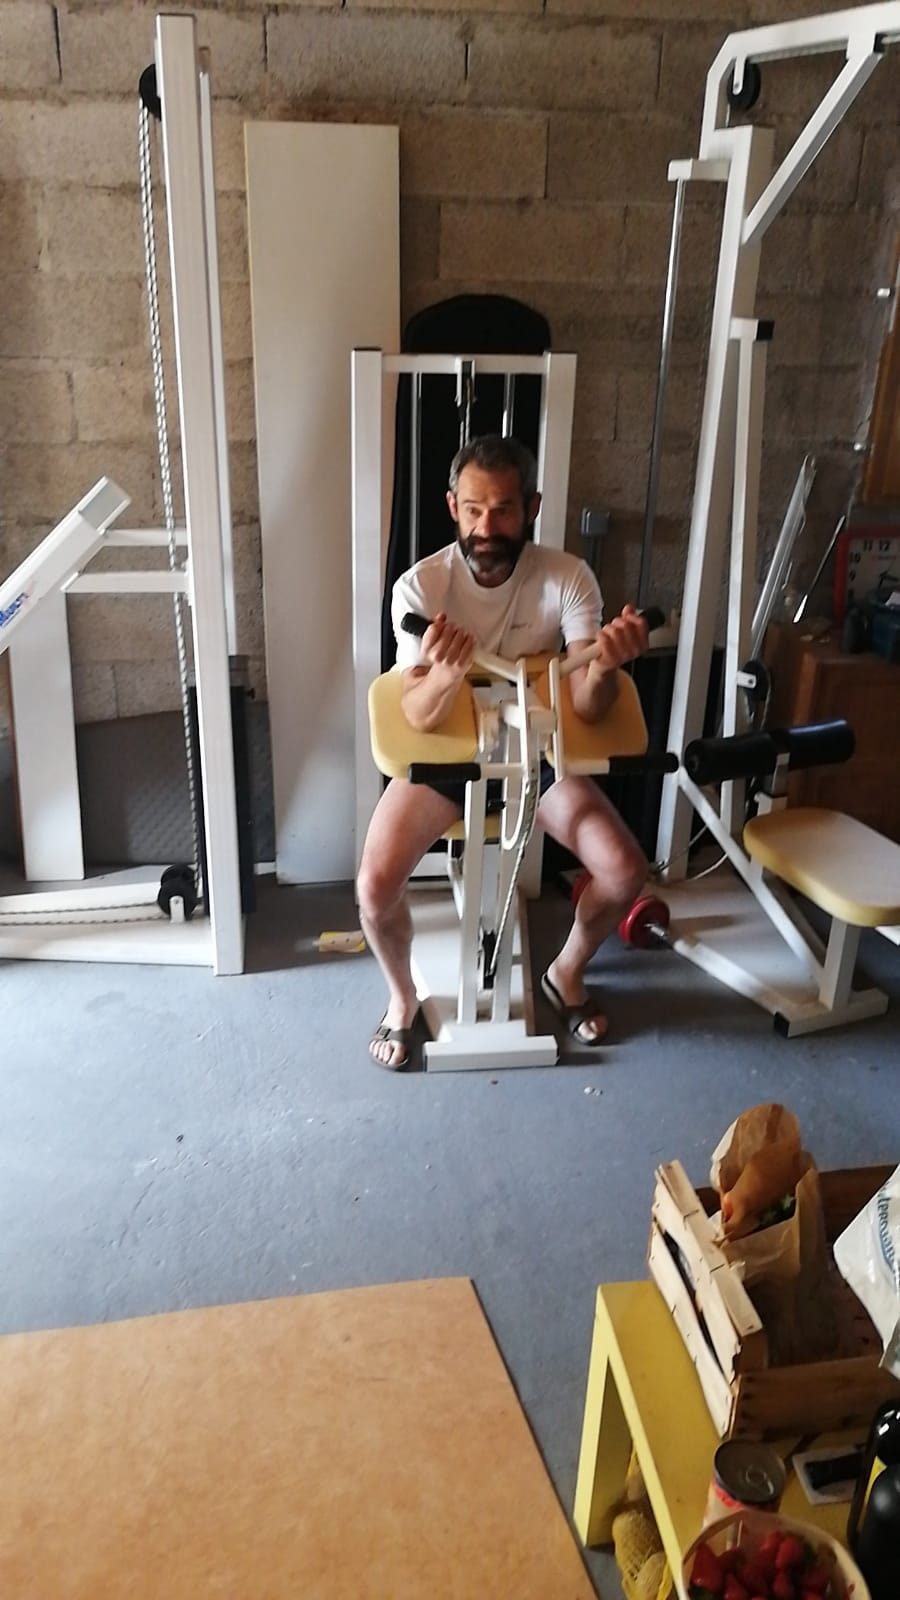 33-Christophe en pleine séance muscu'